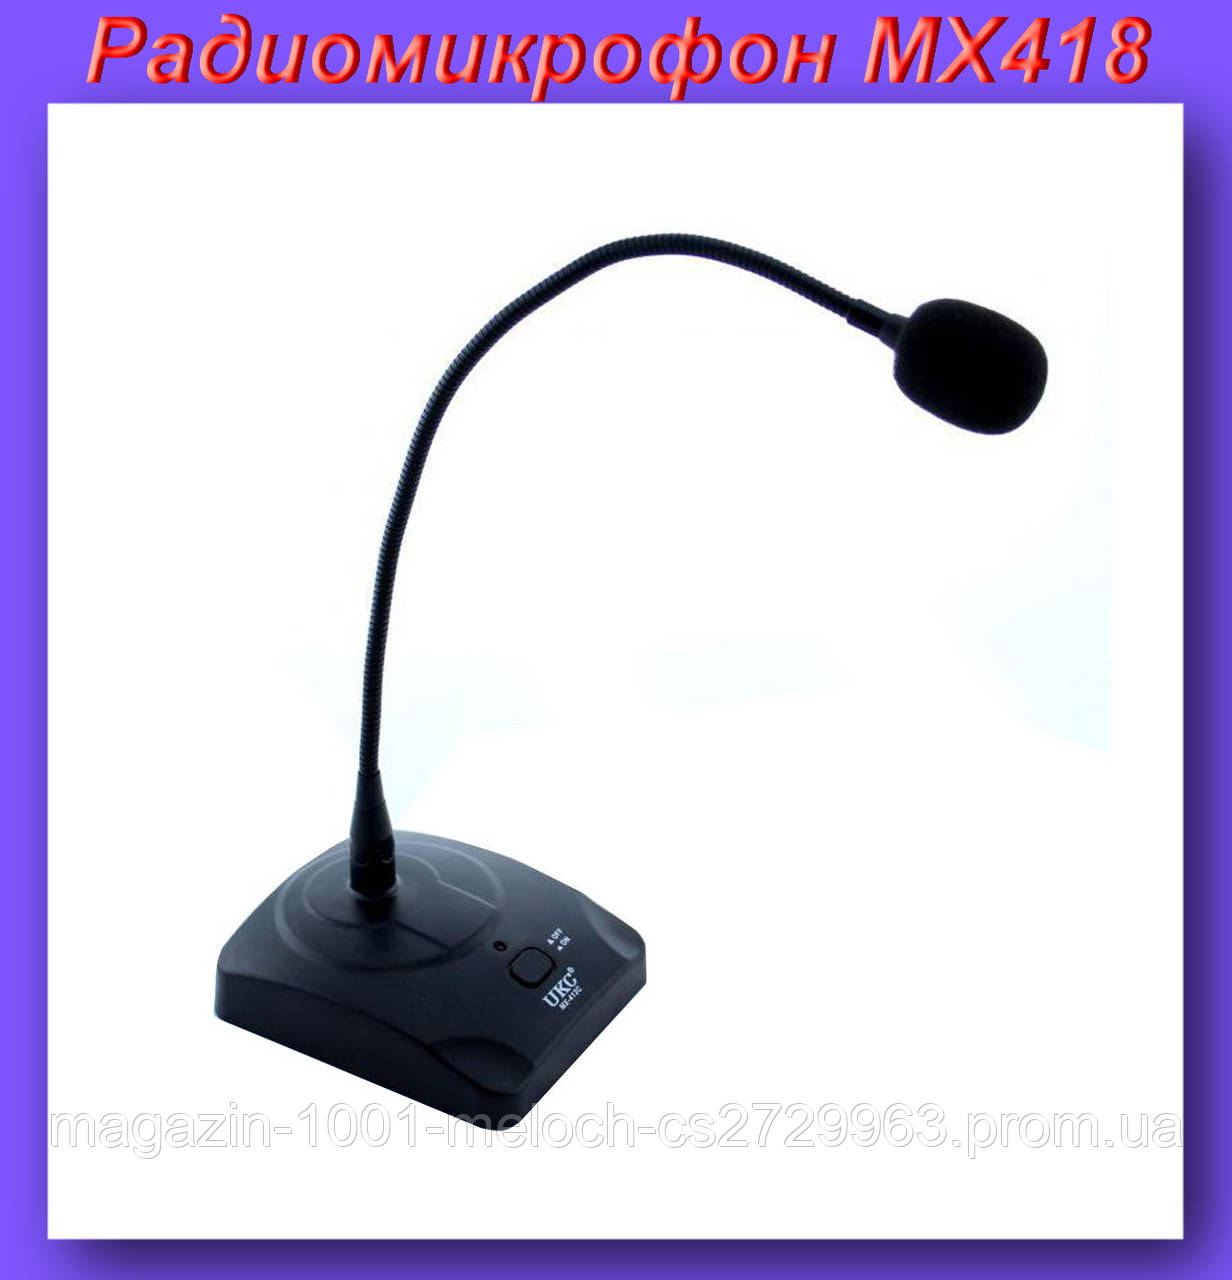 Sale!Радиомикрофон Shure MX418,Микрофон для конференций Shure